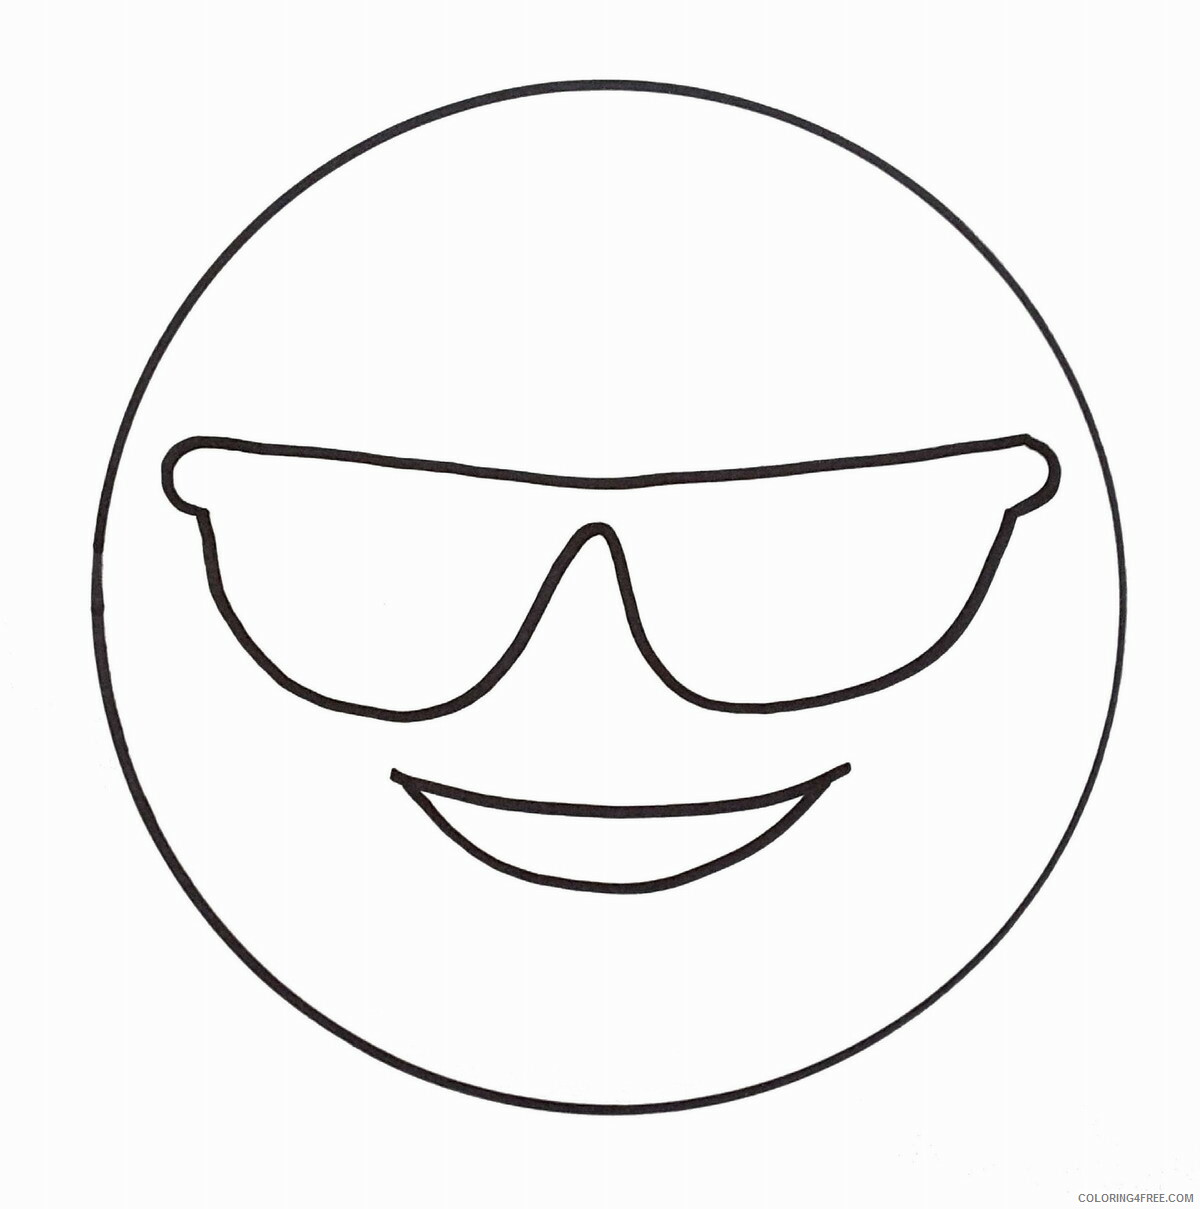 Emoji Coloring Pages emoji18 Printable 2021 2161 Coloring4free